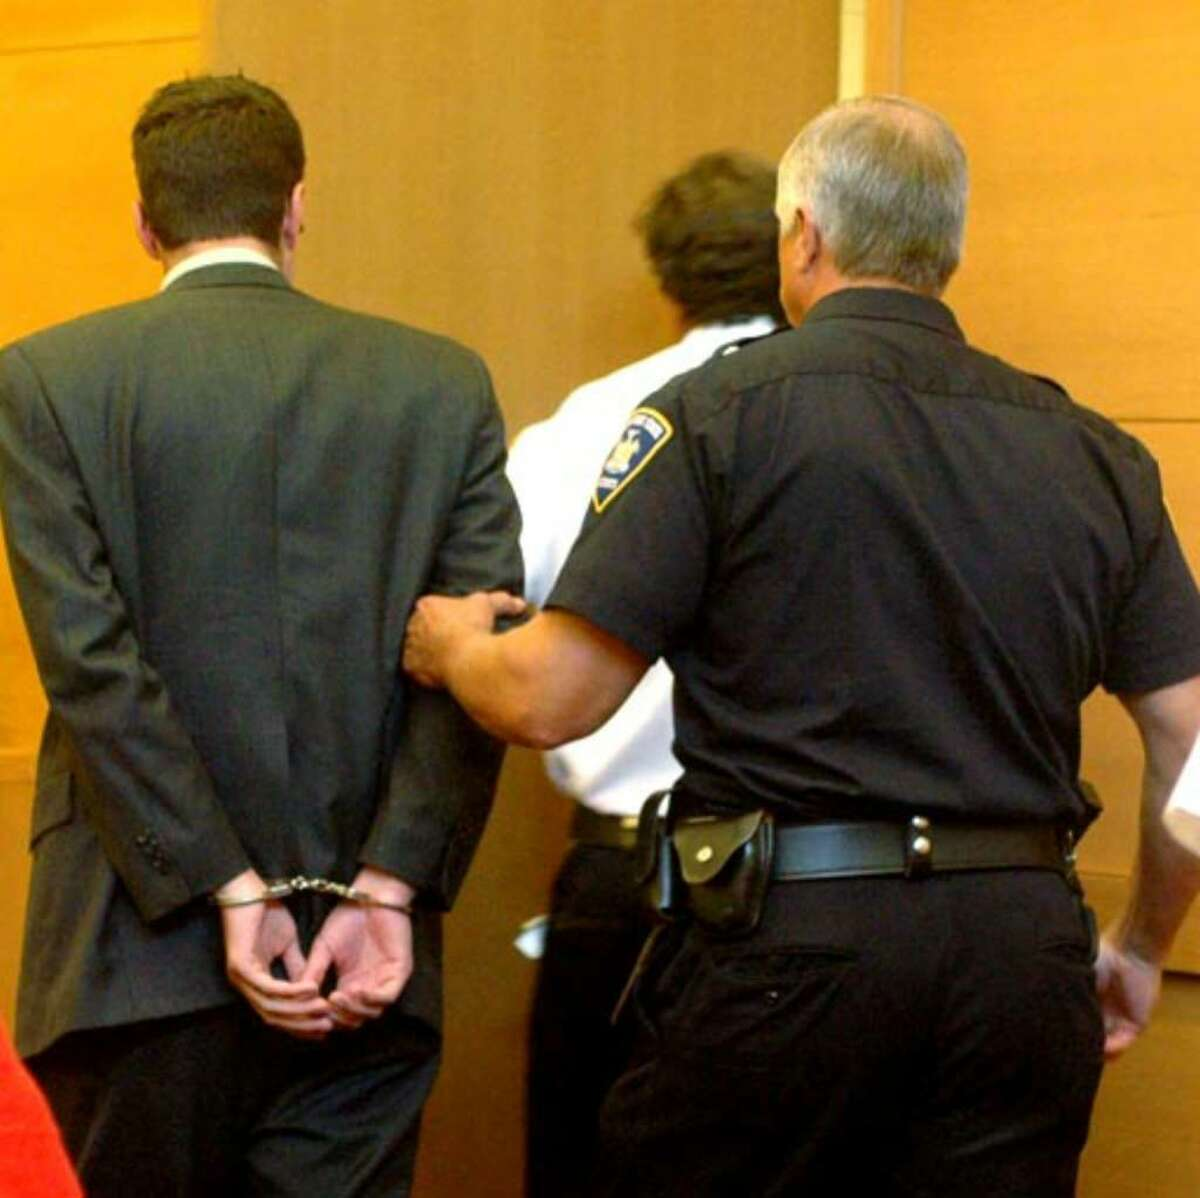 Christopher Porco is taken into custody, Thursday August 10, 2006.